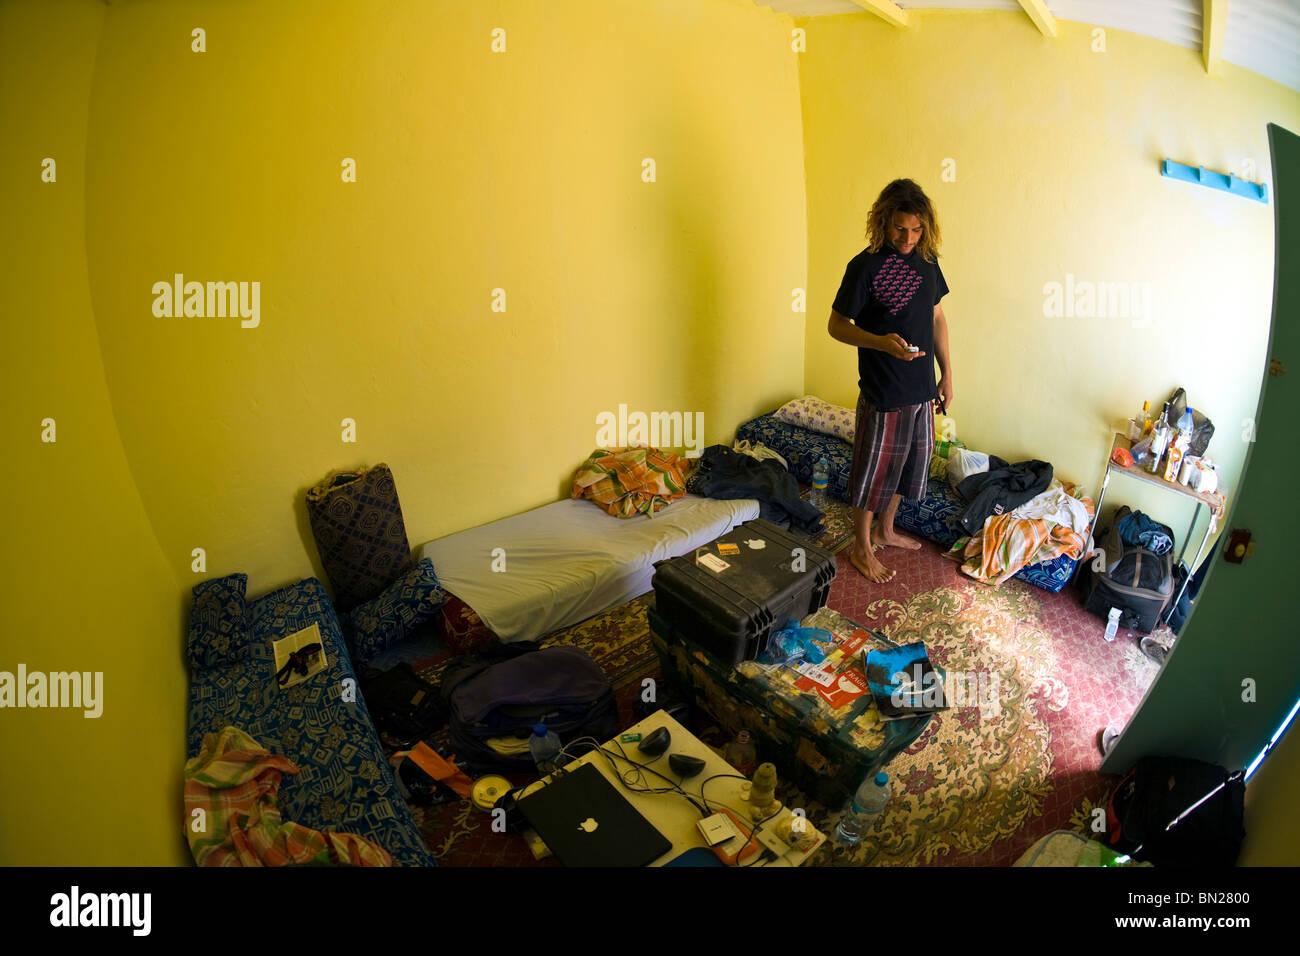 Mauritania, Nouadhibou, hotel room. - Stock Image